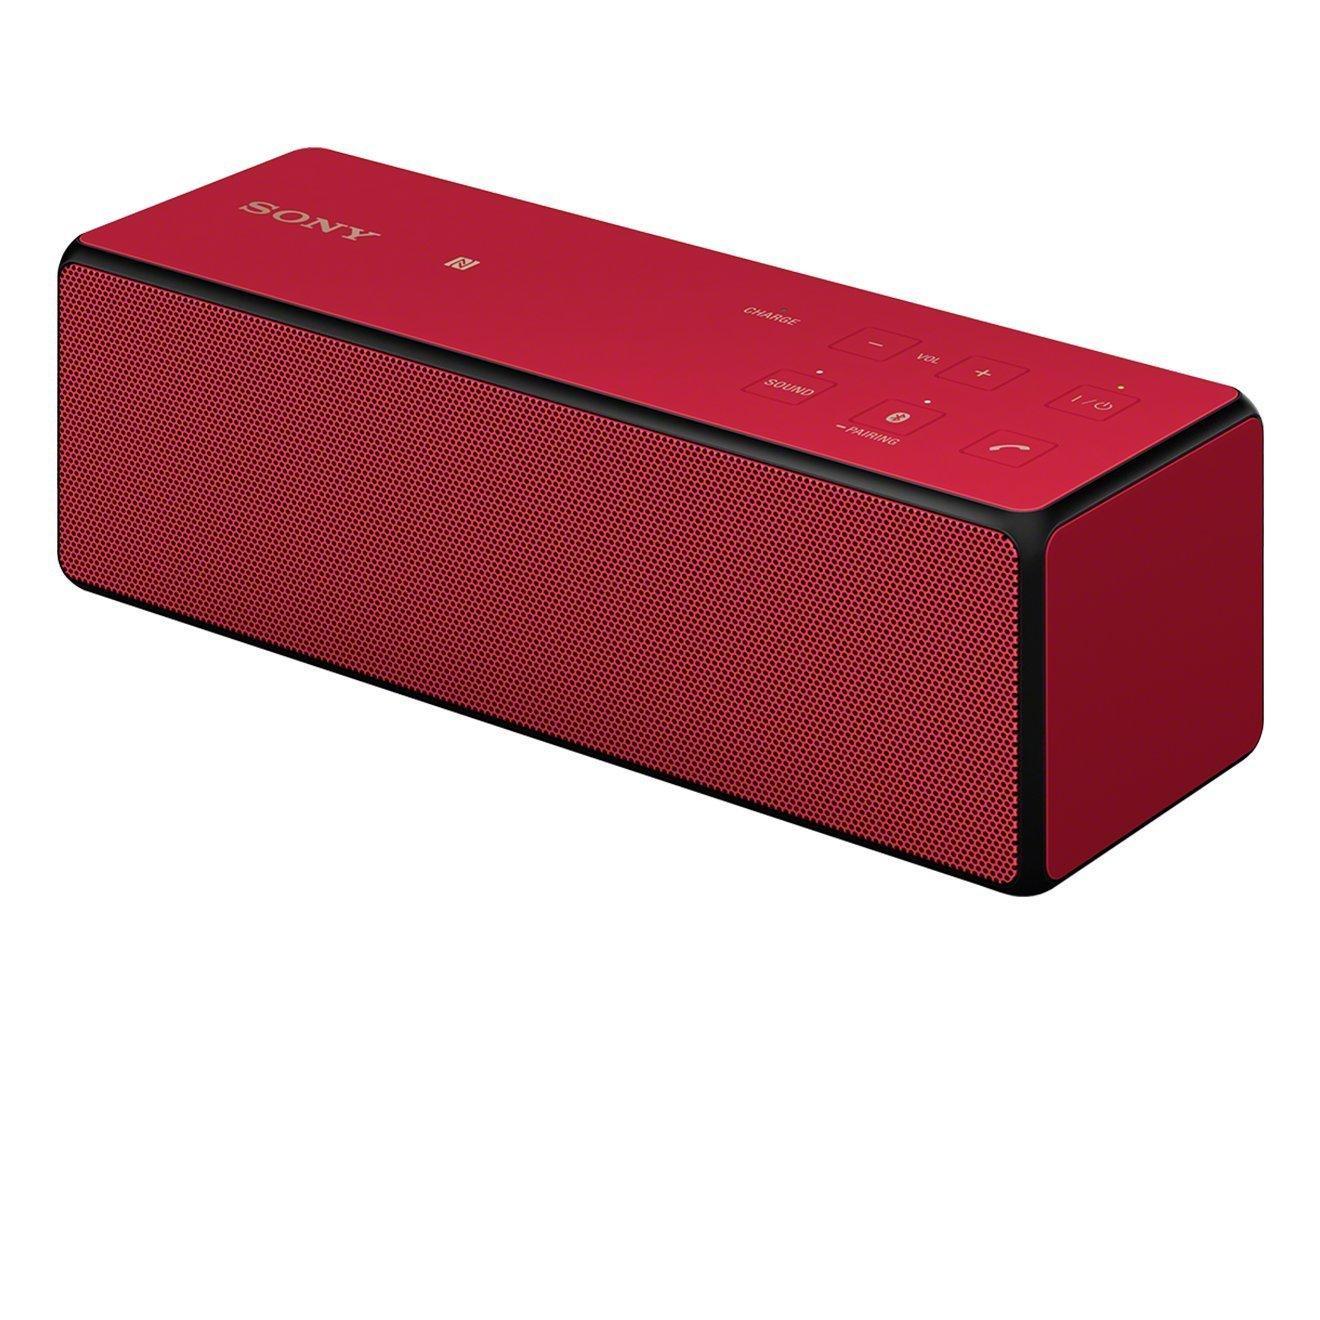 Enceinte bluetooth Sony SRS-X33 - rouge